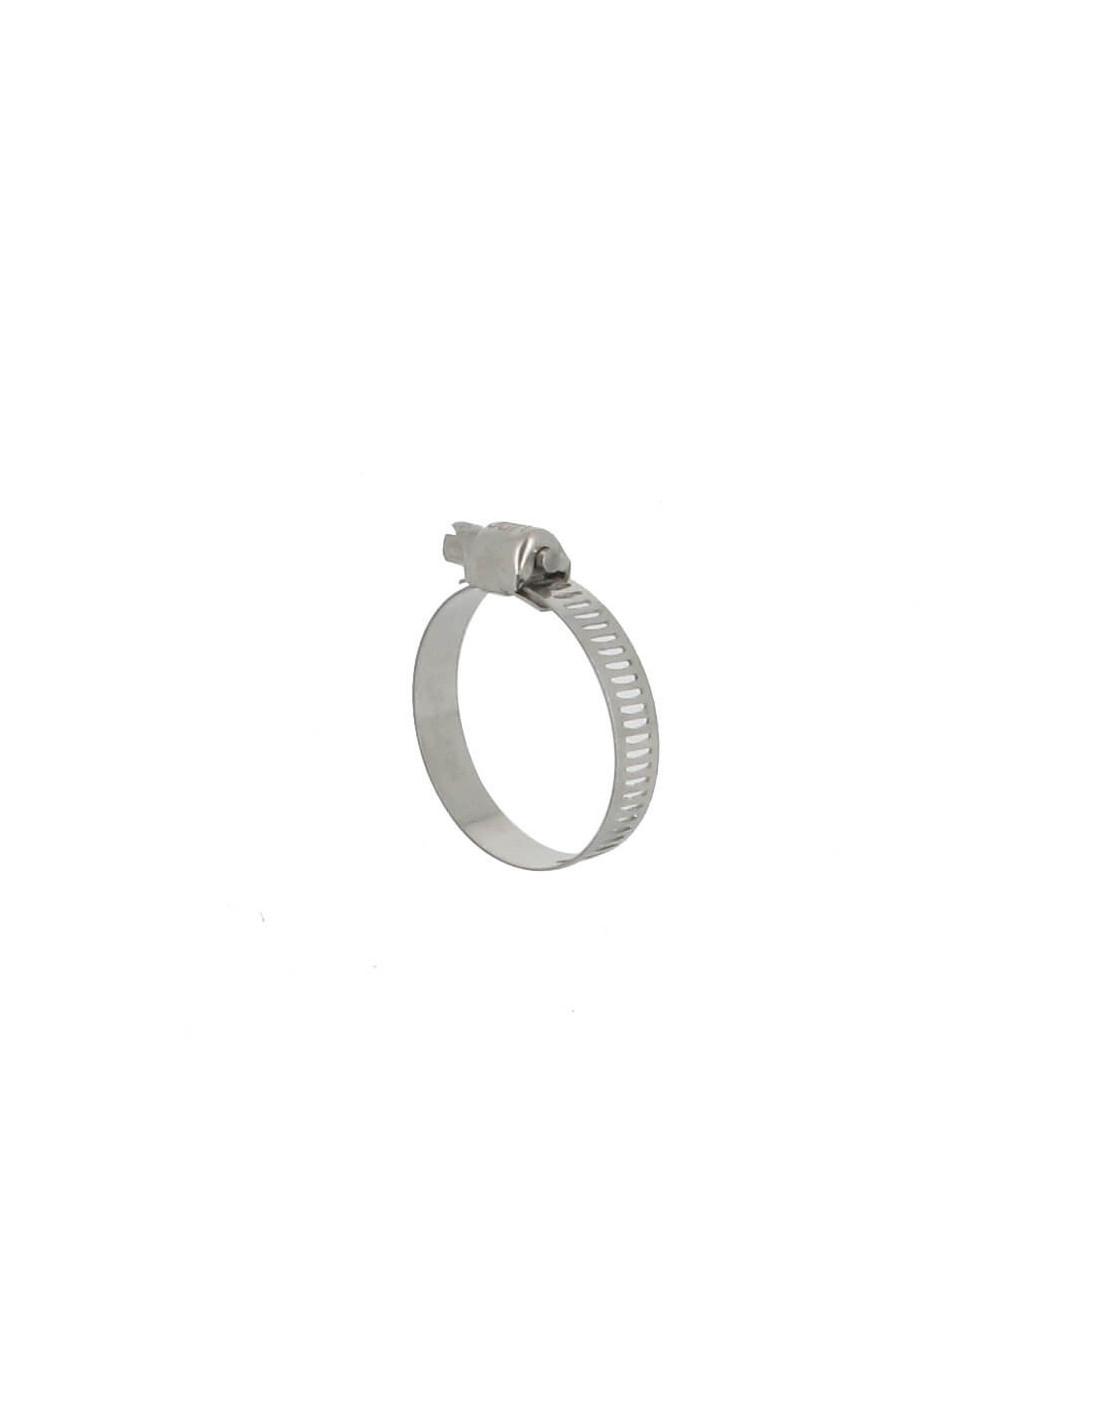 collier de serrage inox 24 36 mm lot de 3. Black Bedroom Furniture Sets. Home Design Ideas